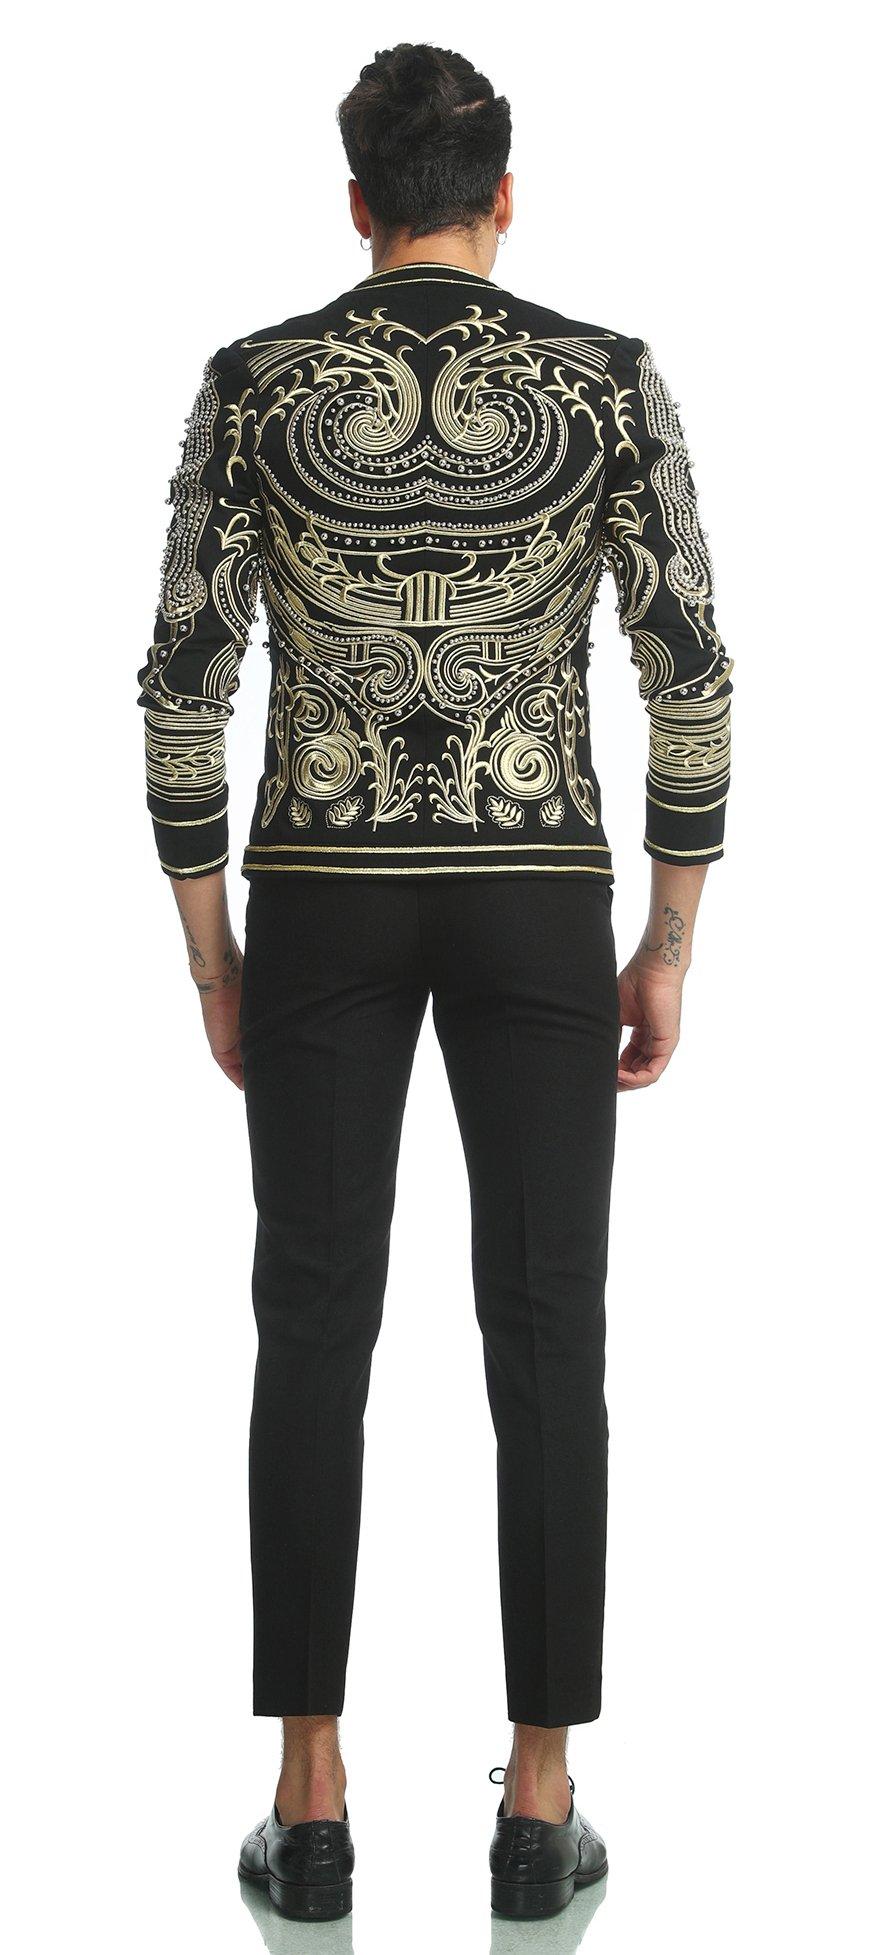 Pizoff Men's Luxury V-Neck Slim Fit Stylish Suit Blazer Jacket Long Sleeve Formal Dinner Dress AD001-02-L by Pizoff (Image #3)